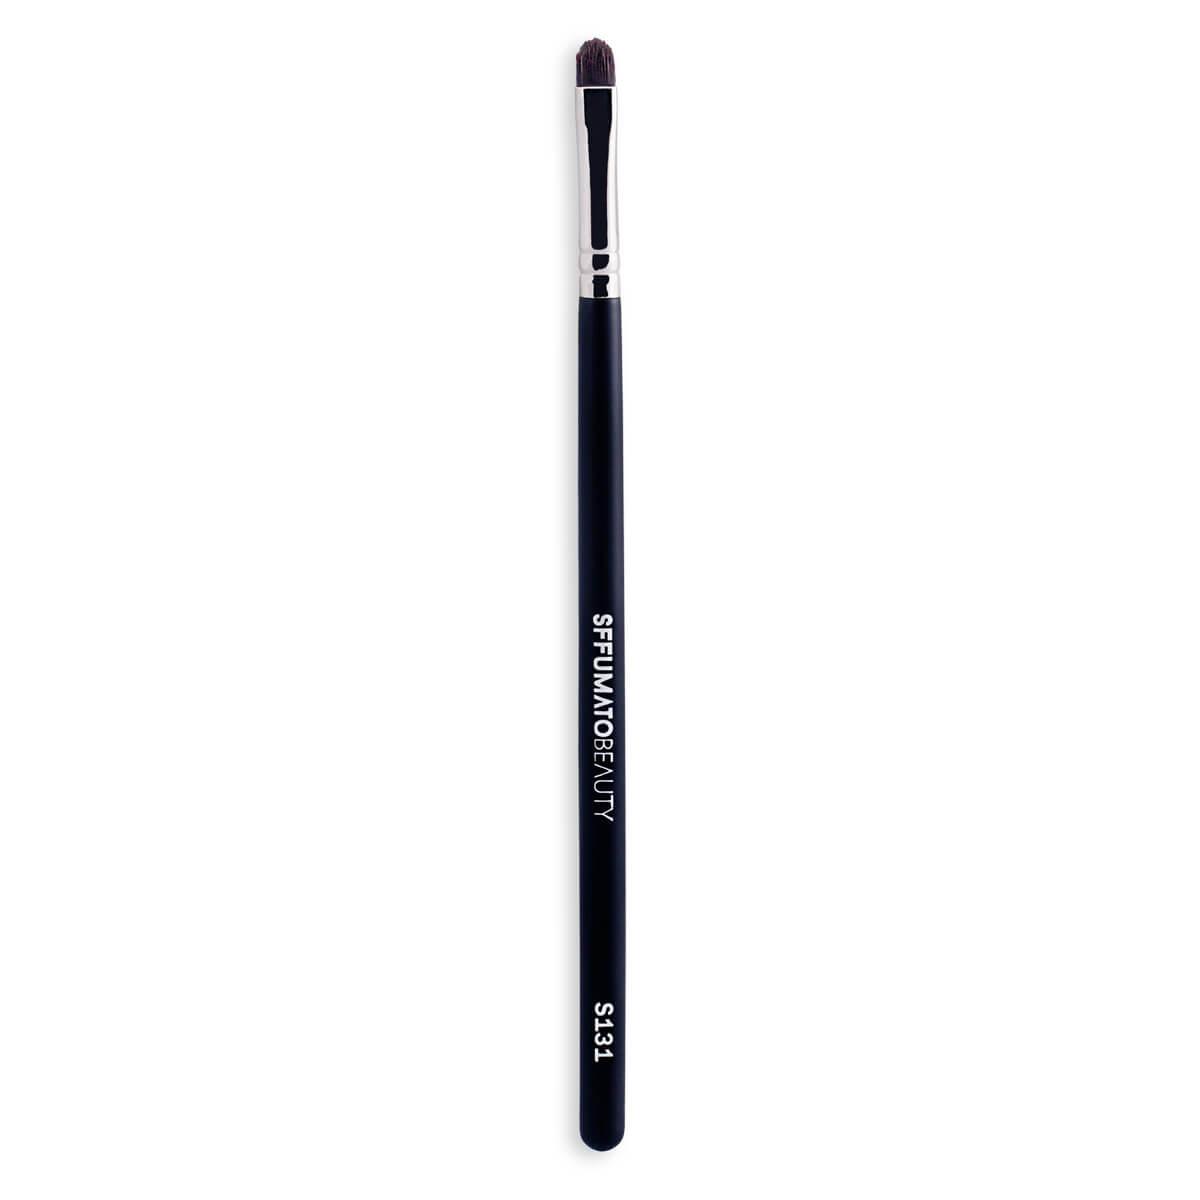 S131 - Pincel Para Batom Profissional Sffumato Beauty